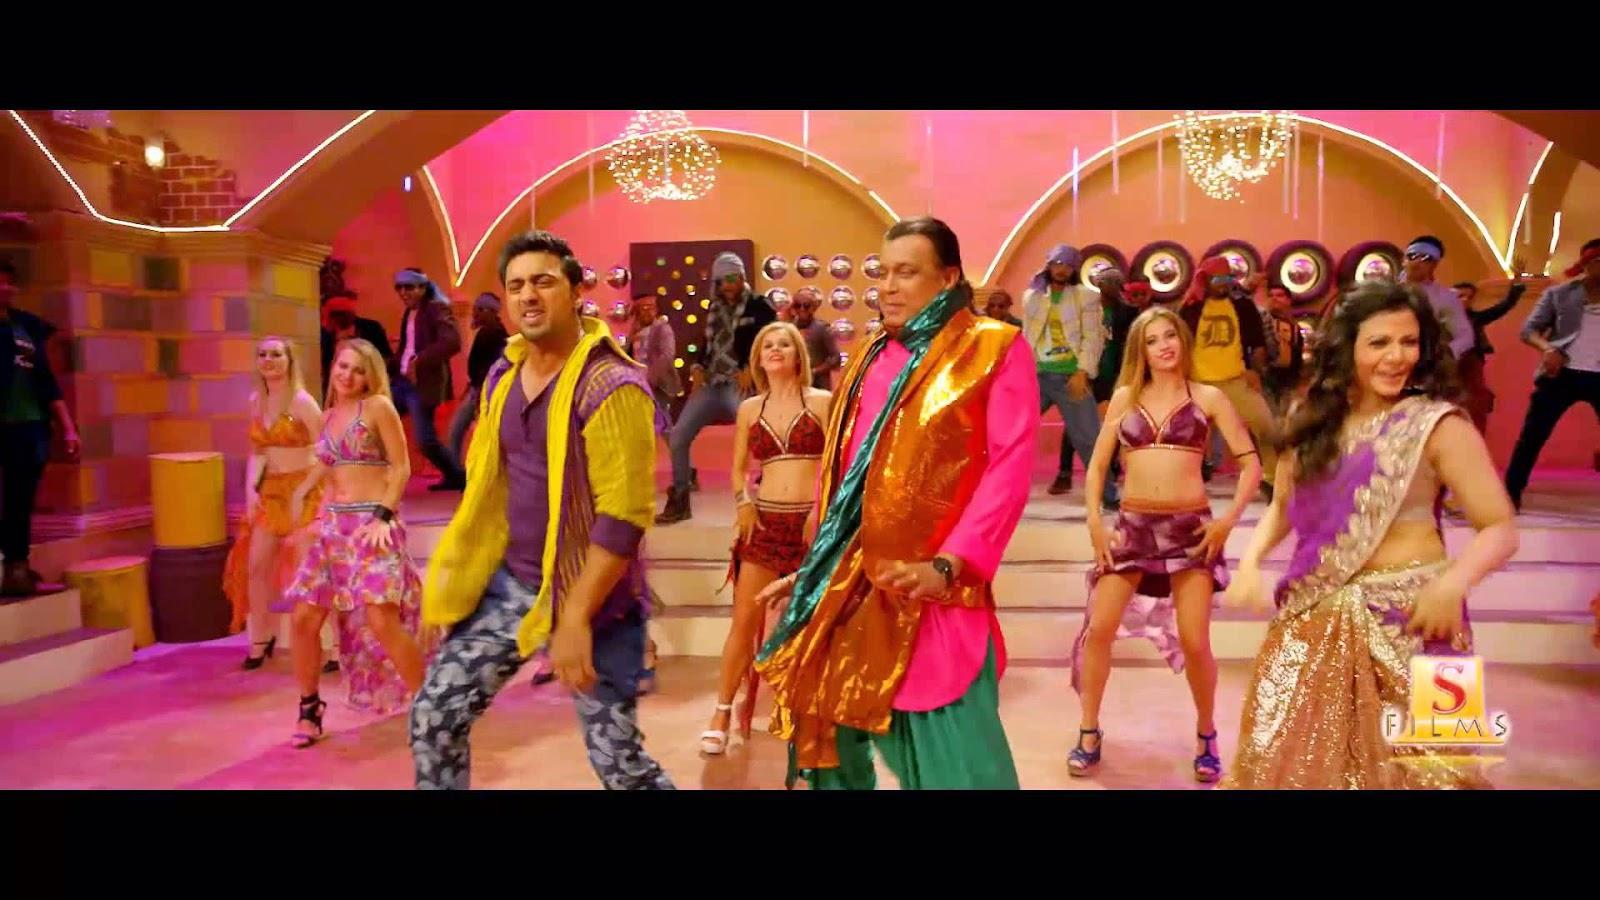 Part 1 DJMaza Bollywood Songs Download